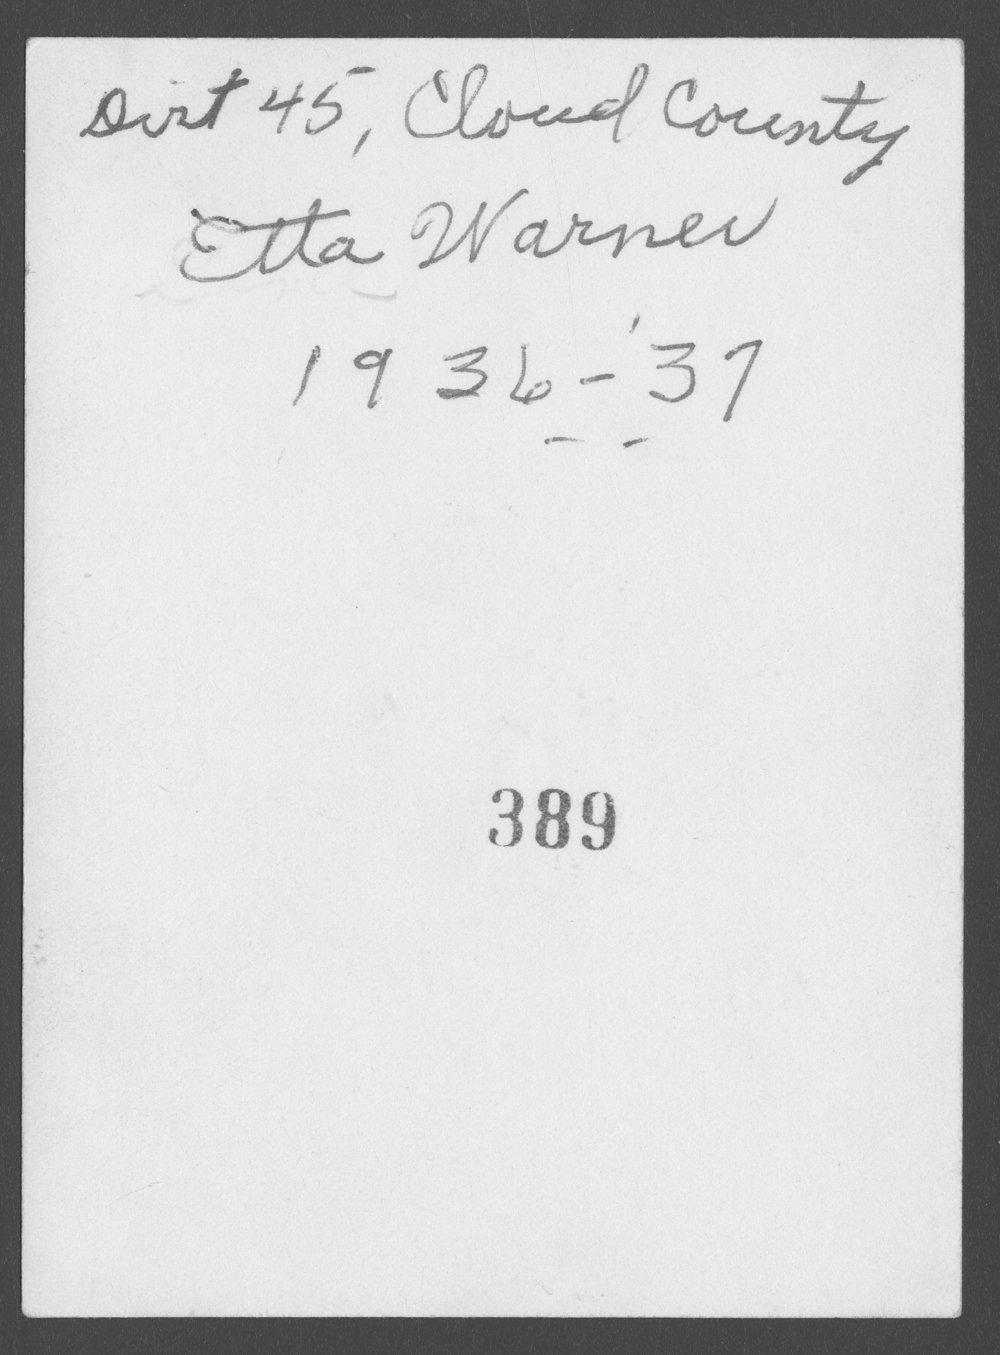 Etta Warner - 2